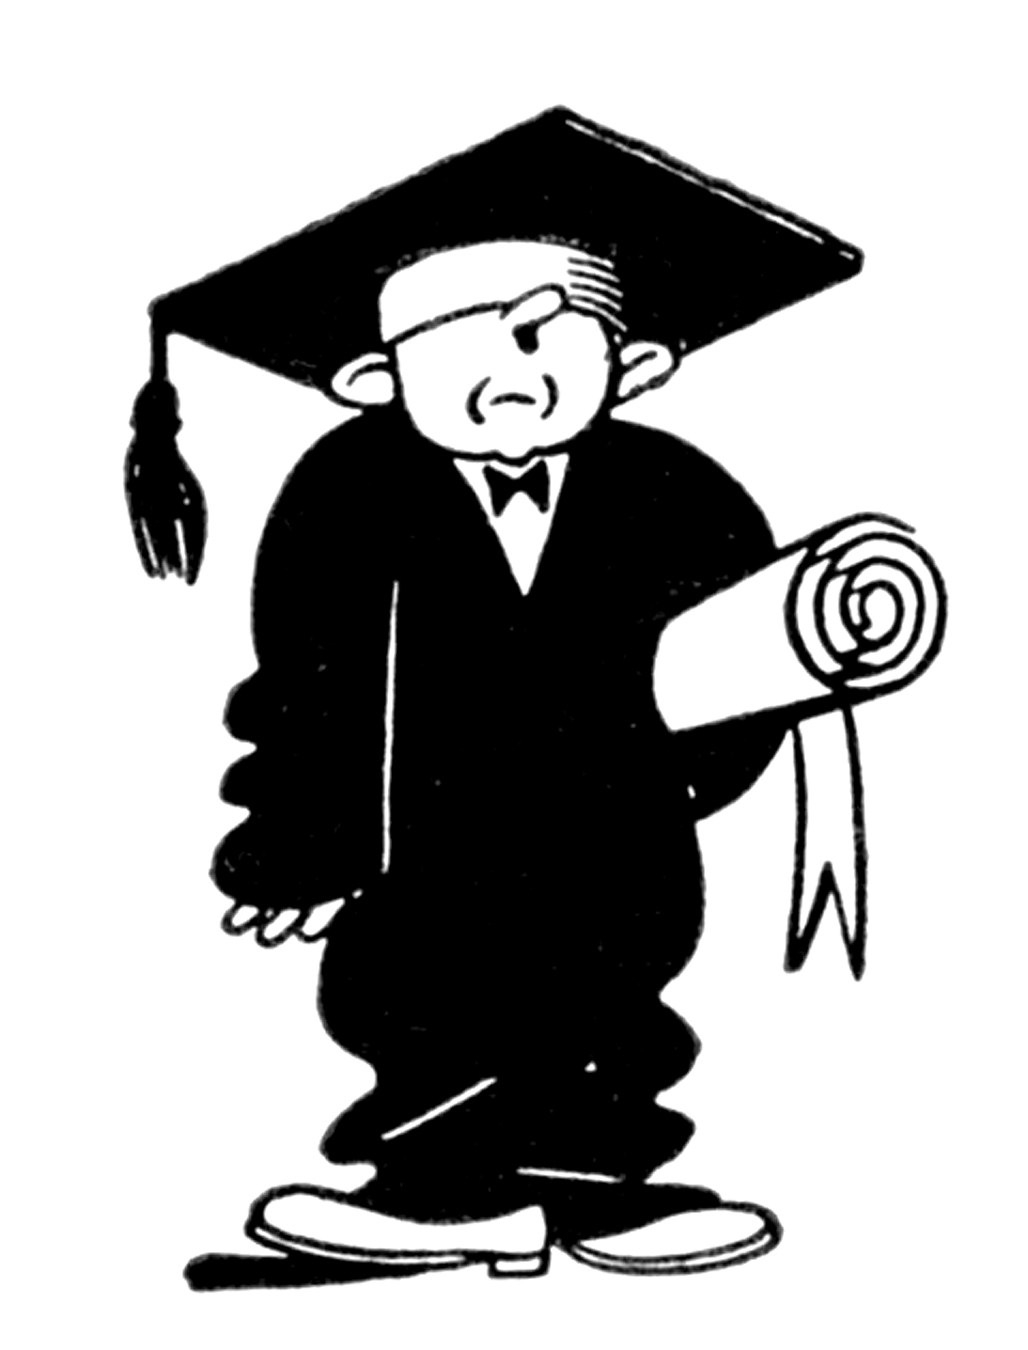 Quirky Retro Graduate Clip Art - Education - The Graphics ...